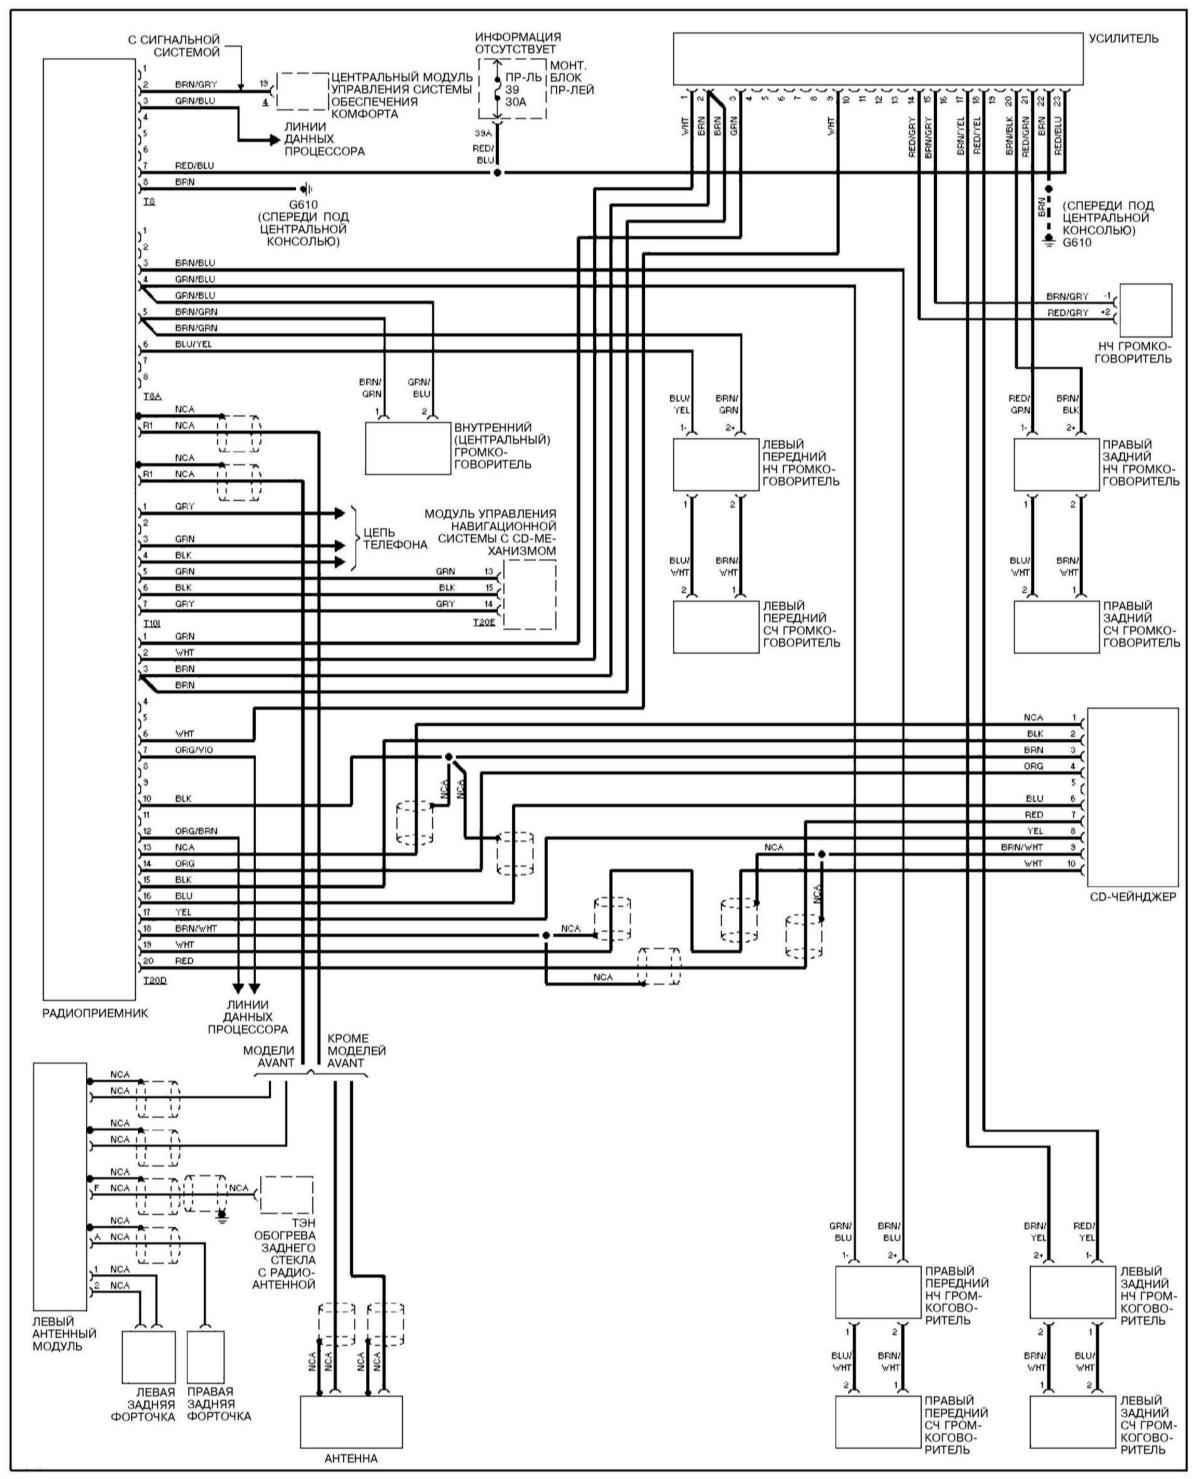 Аудиосистема с усилителем (Ауди А4 Б6, 2000-2006